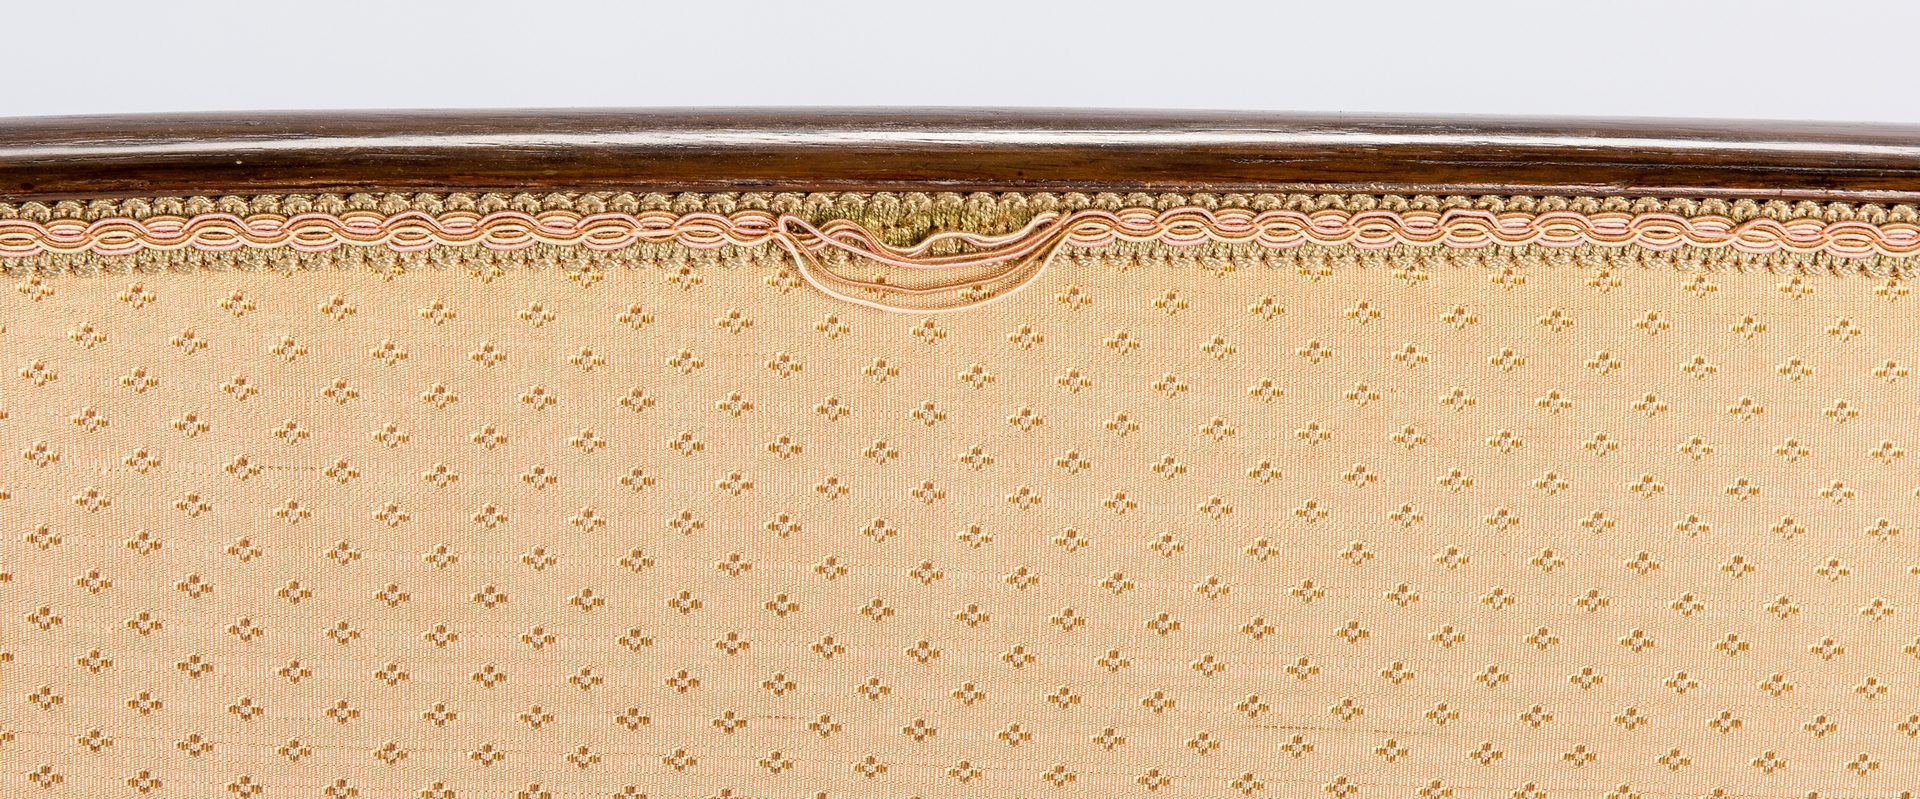 Lot 441: Sheraton Inlaid Sofa